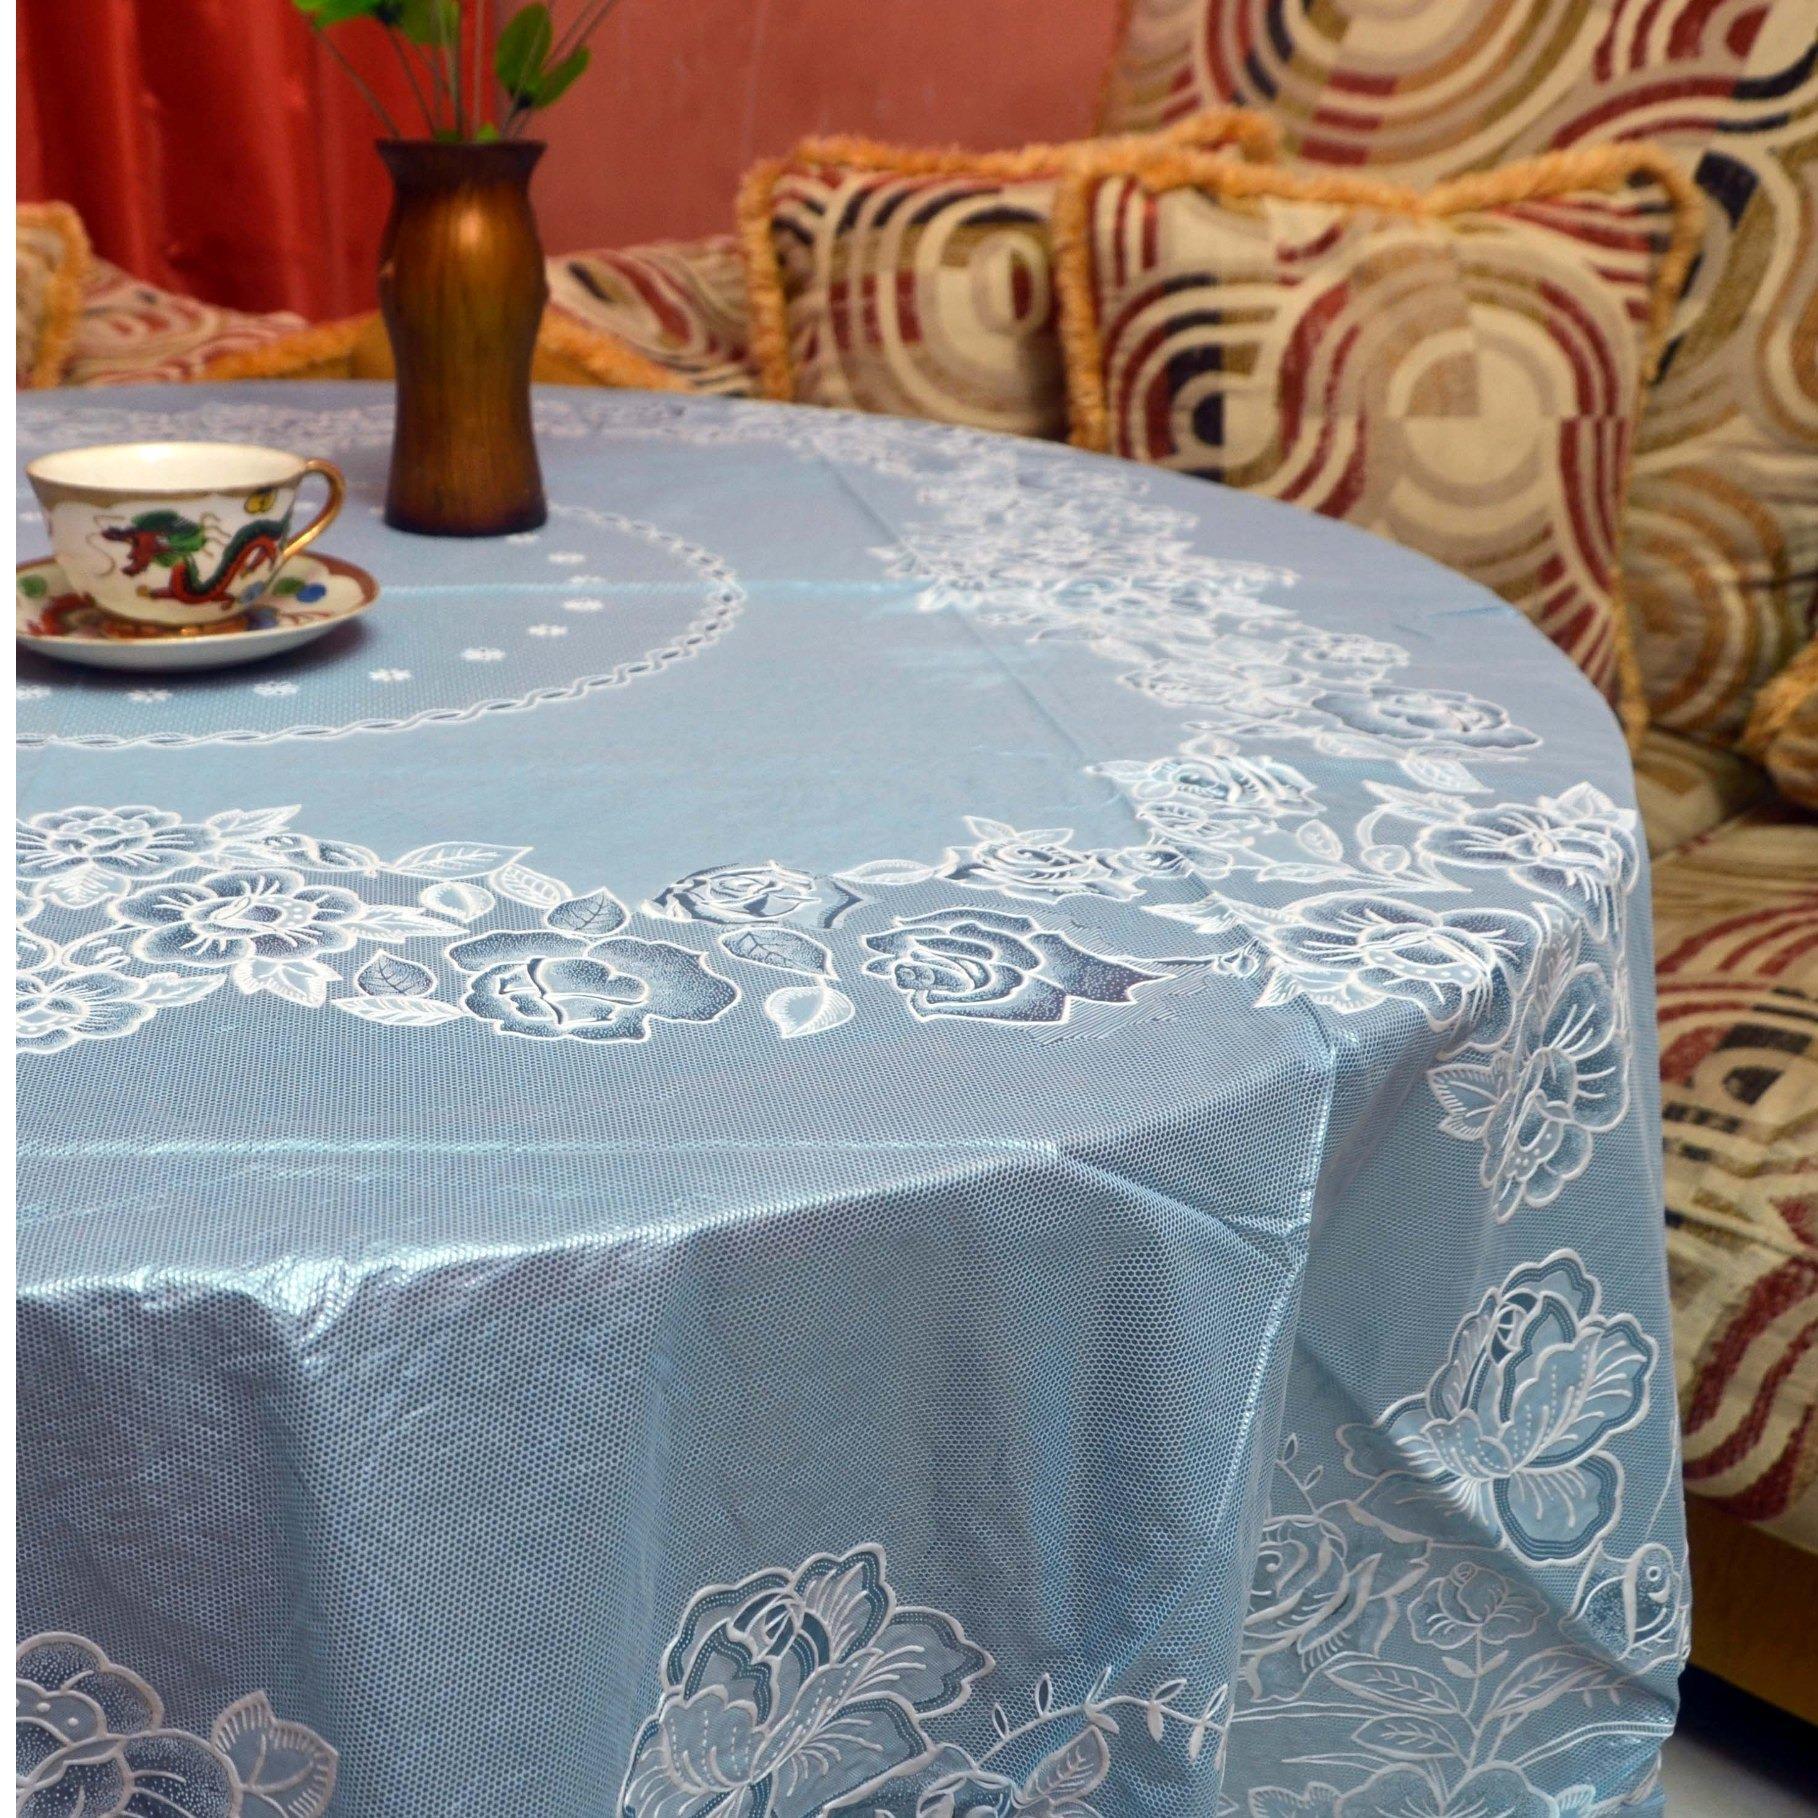 Taplak Meja Makan Vinyl-Lace Bulat @180cm Soft Color